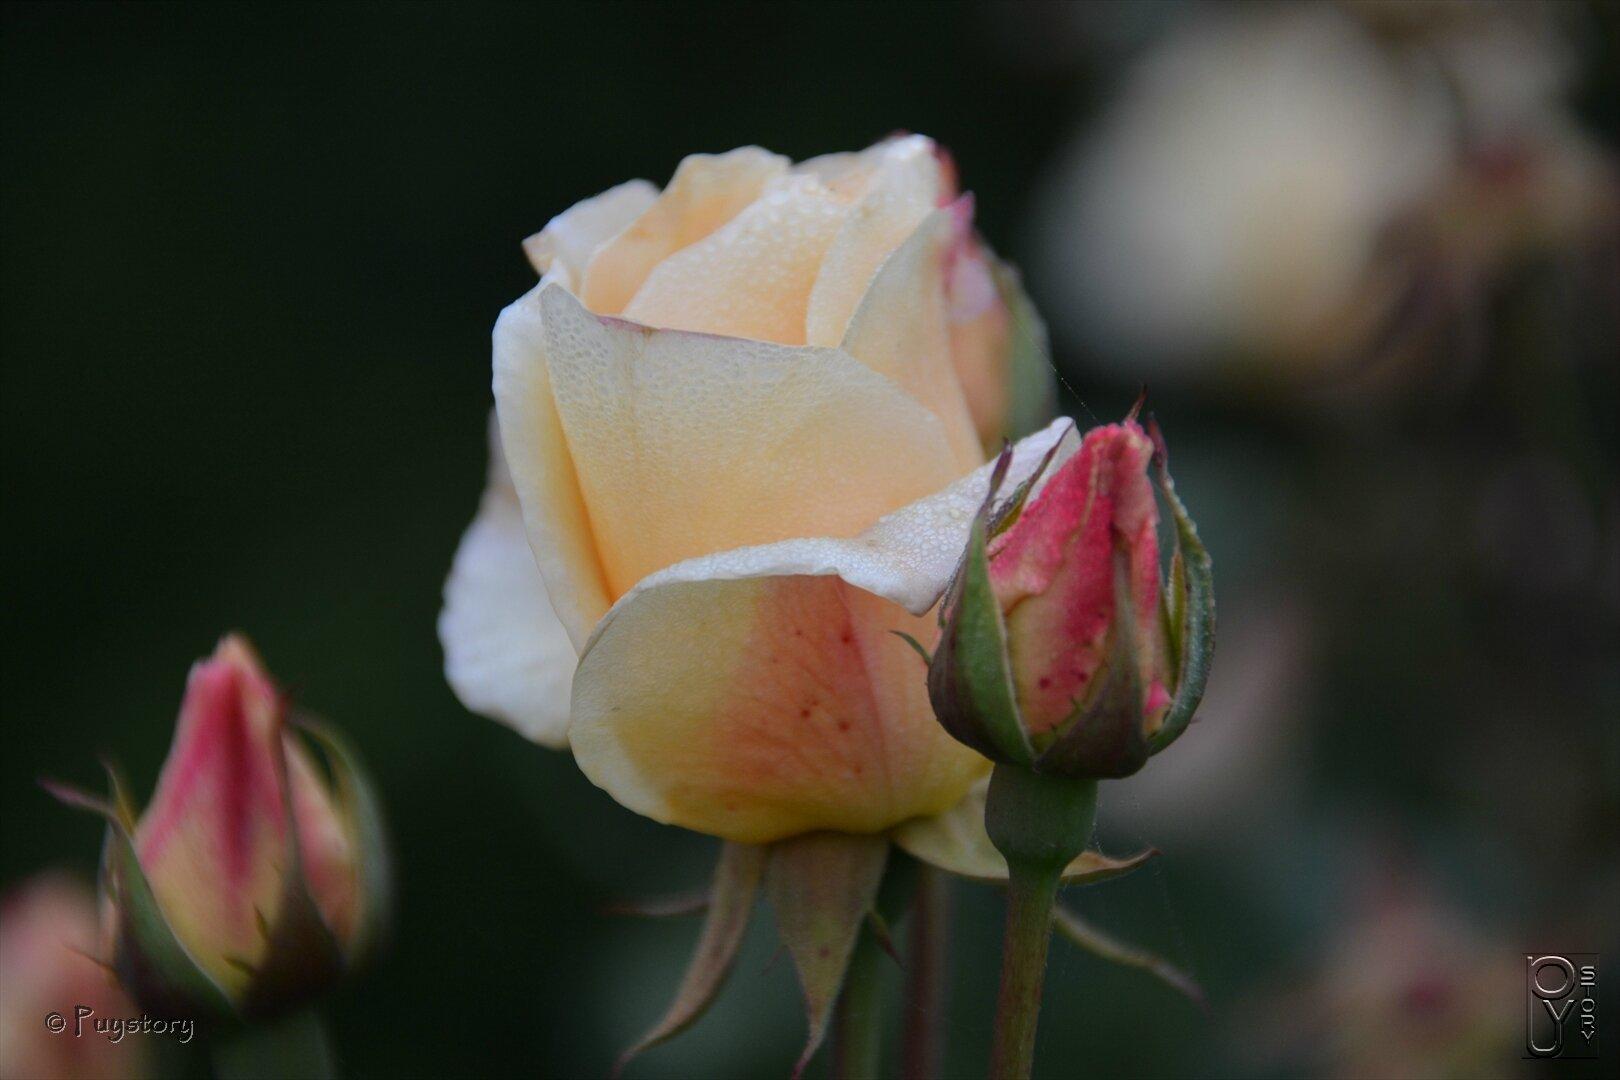 En rose et jaune.